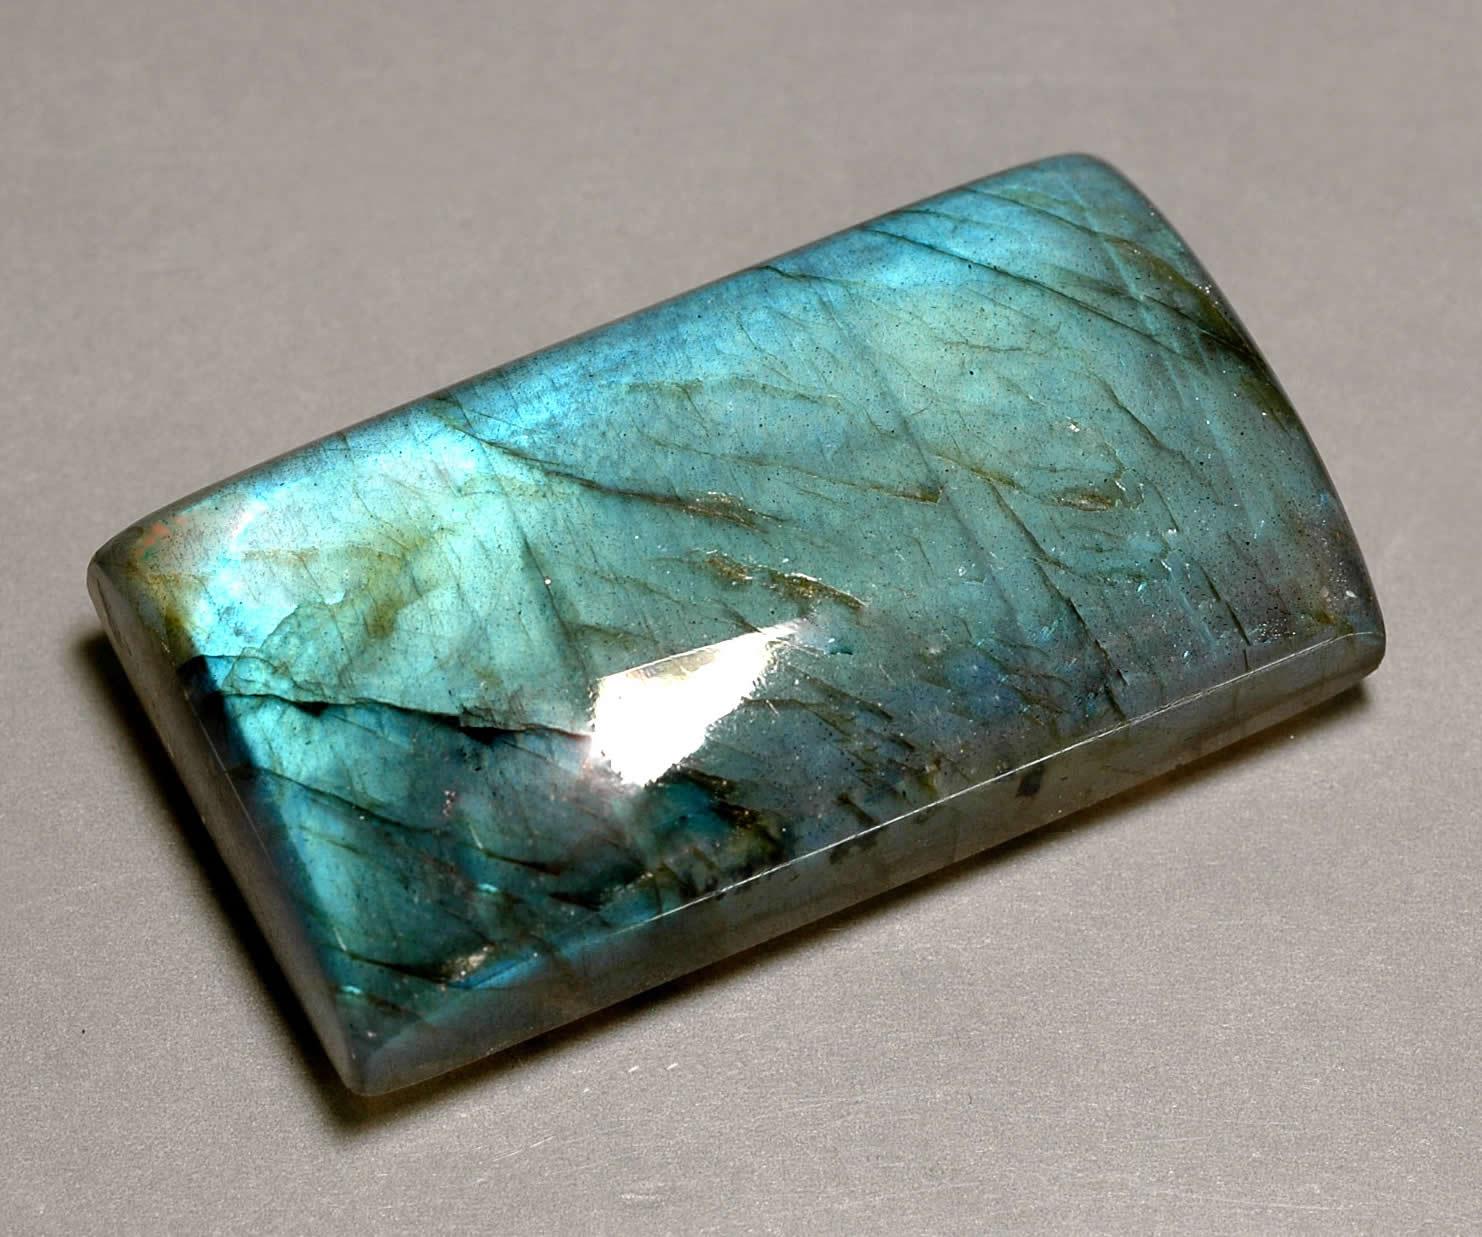 25 Pcs Oval 6x8 MM Egyptian Peridot Quartz Calibrated Loose Gemstone Wholesale